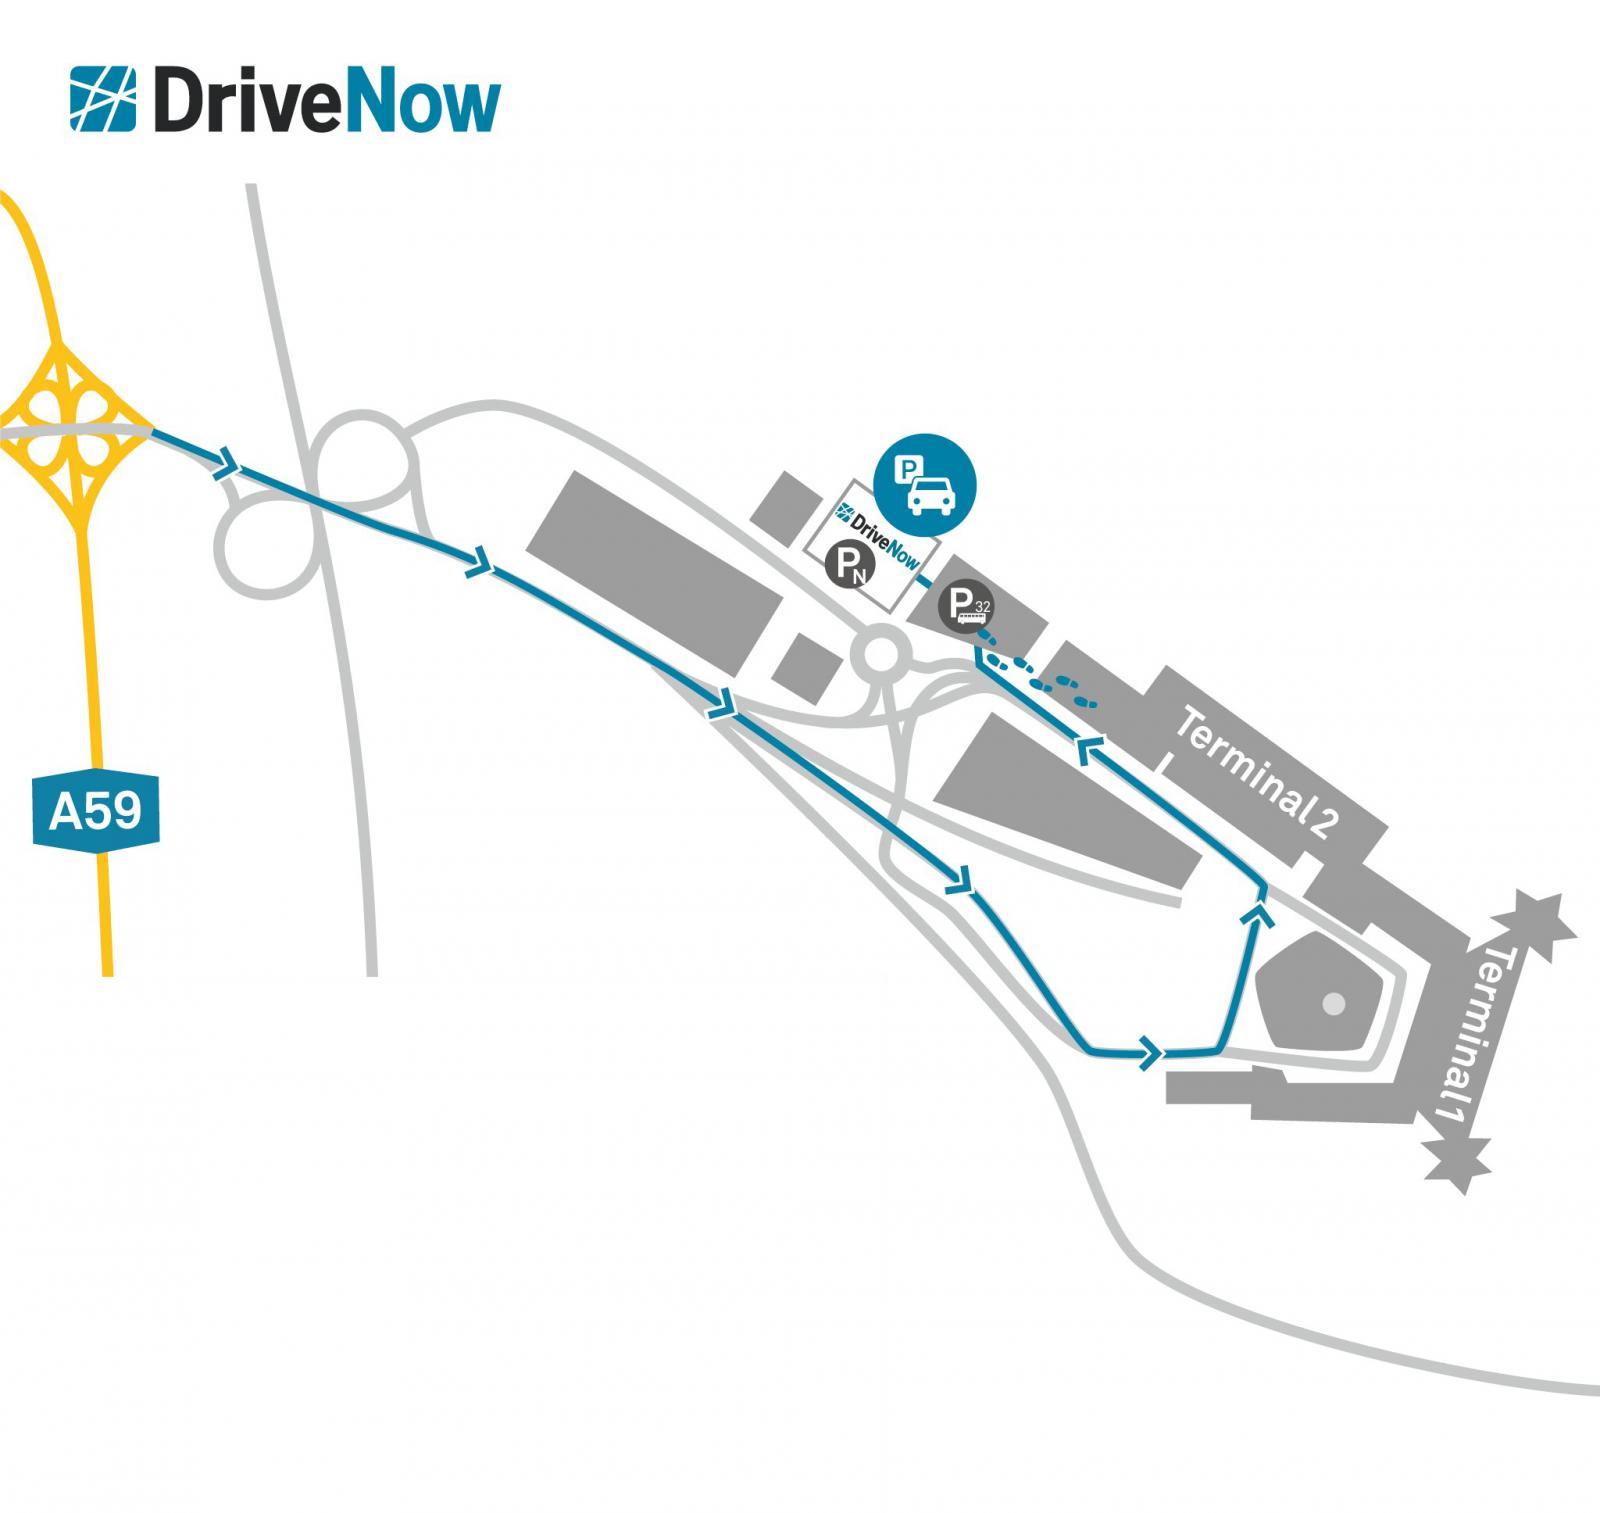 carsharing_DriveNow-Flughafen-Wegweiser-Koeln_DE_1